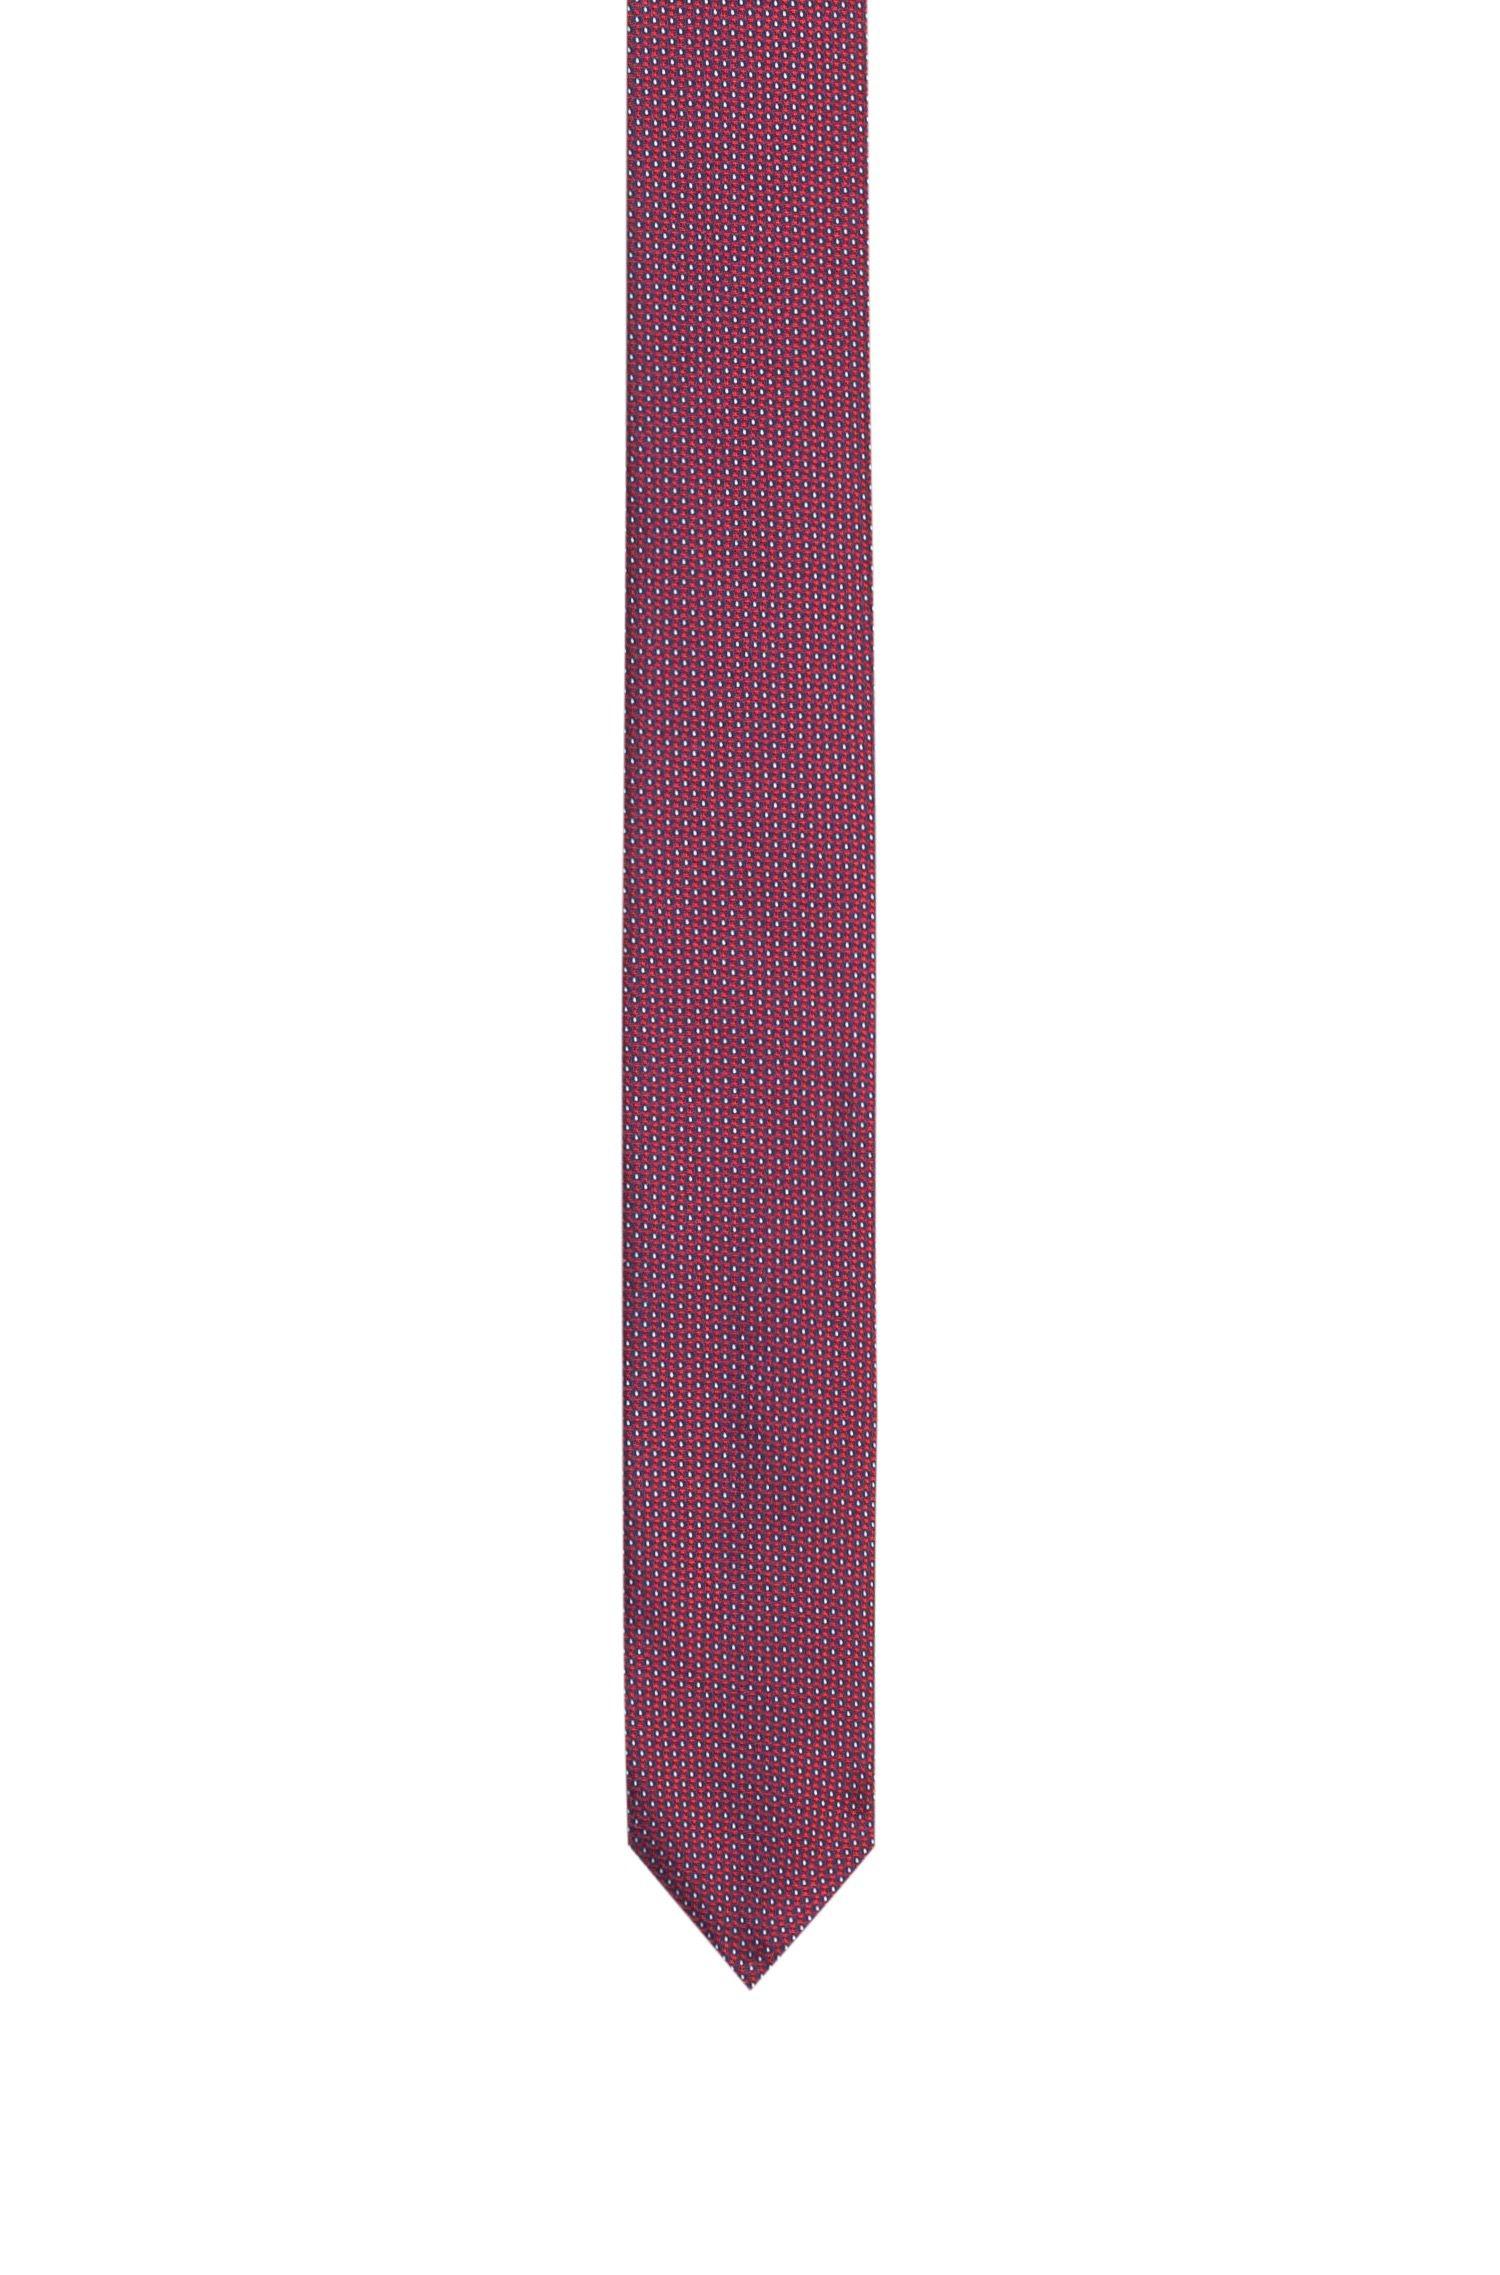 Gerade geschnittene Krawatte aus Seide mit dezentem Muster, Gemustert